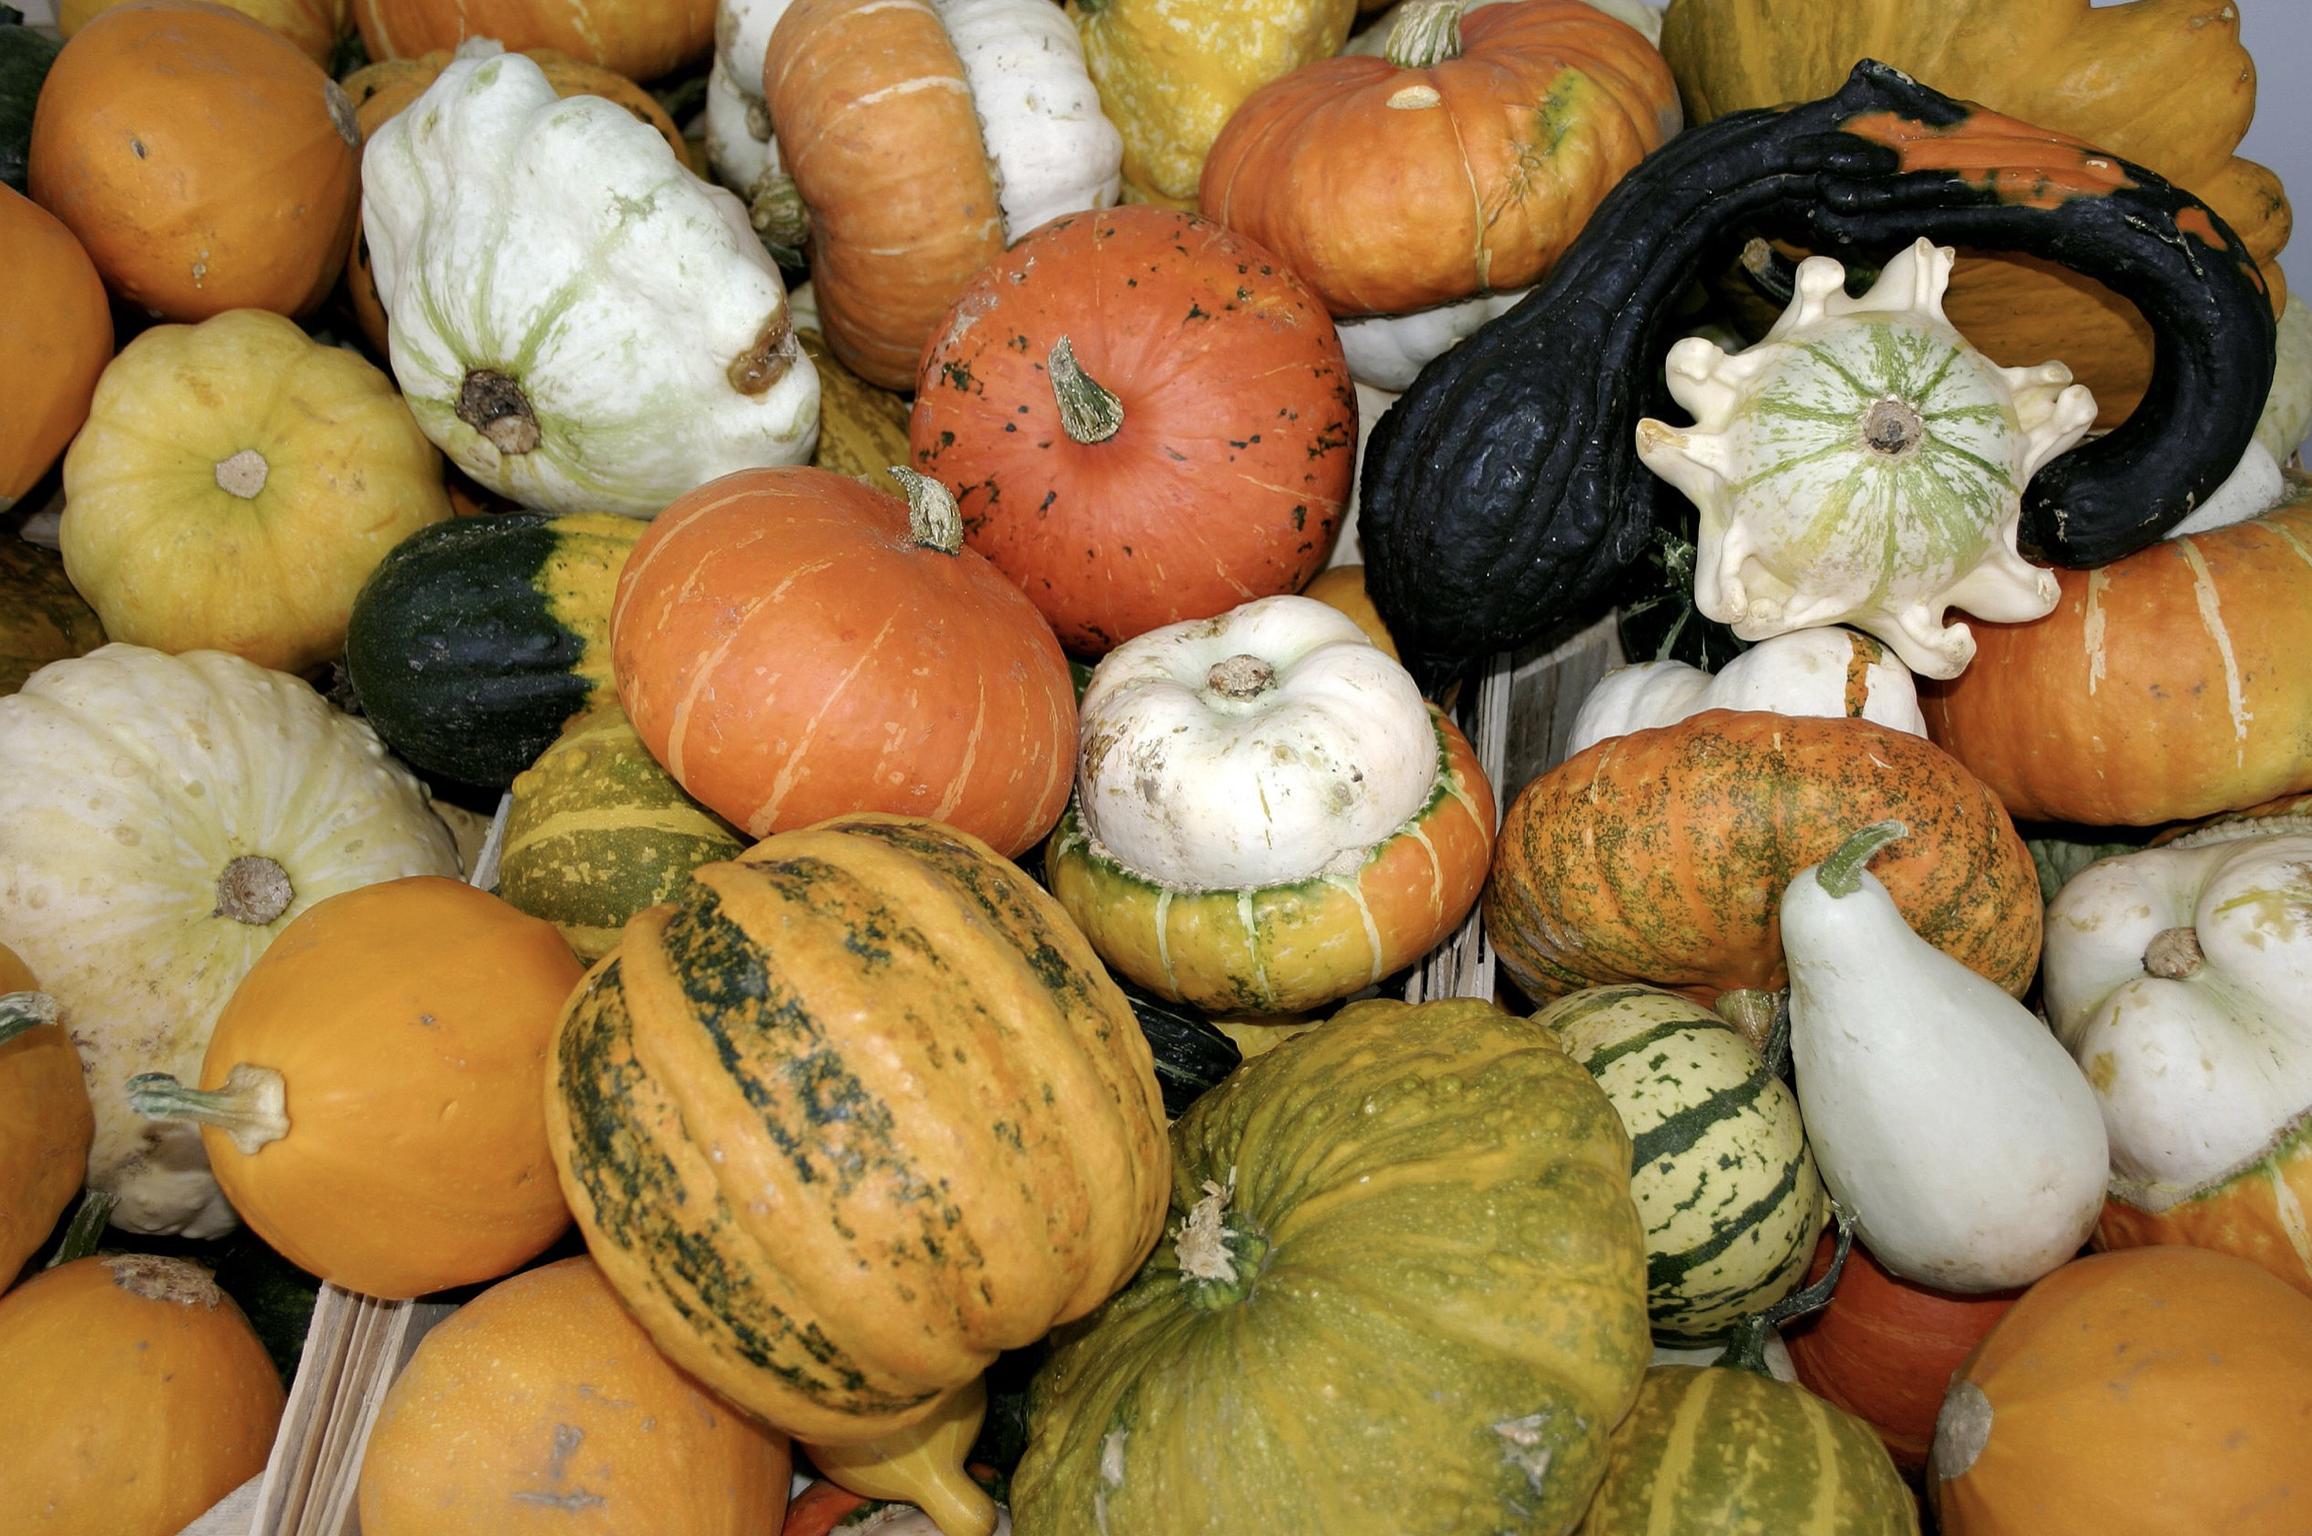 https://commons.wikimedia.org/wiki/Category:Autumn#/media/File:-_Pumpkins_-.jpg